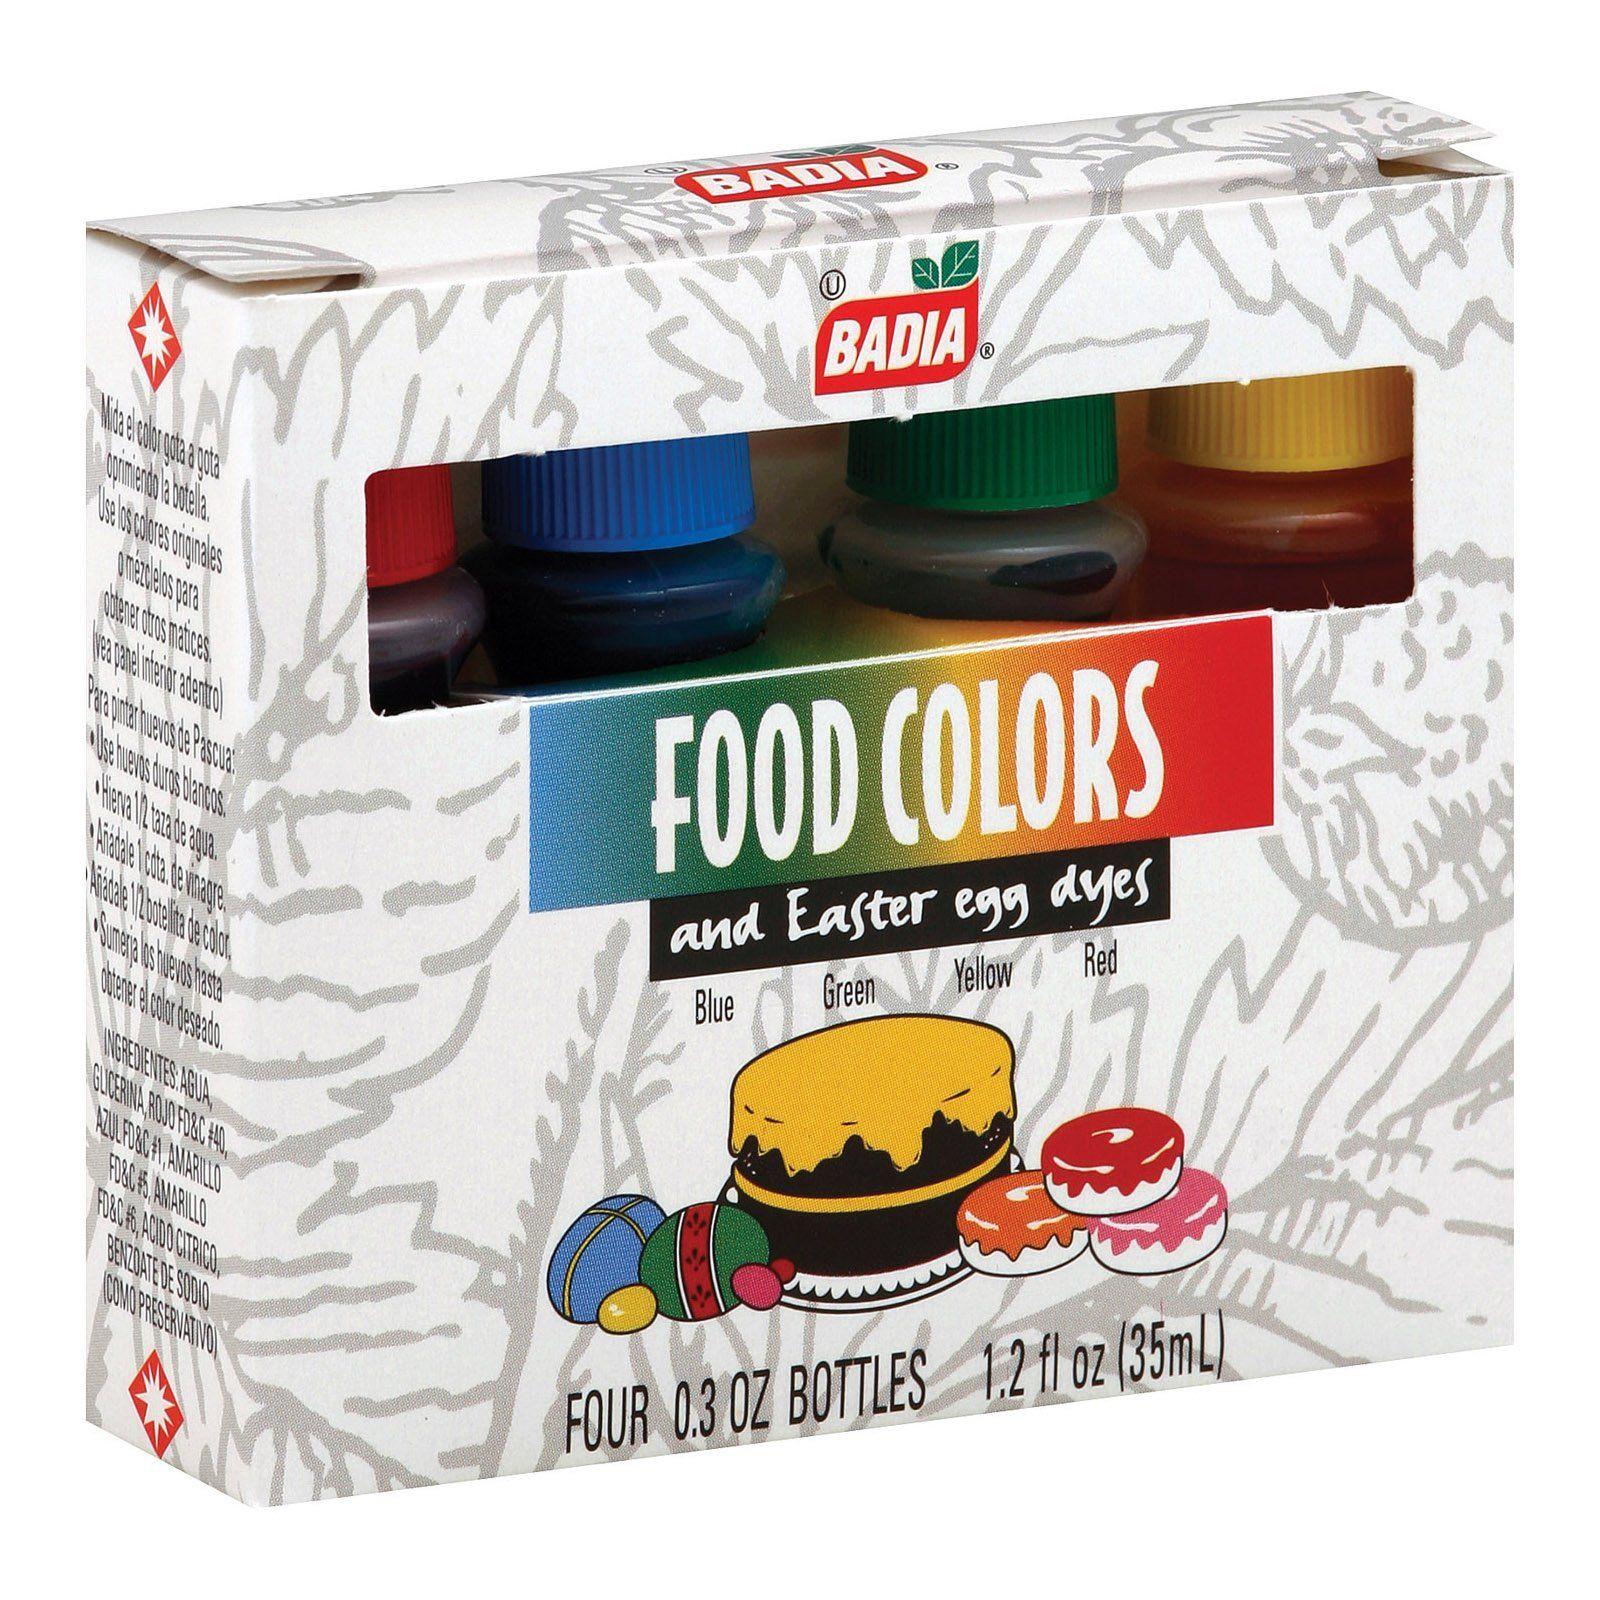 Badia Spices Food Colors Case Of 12 1.2 Fl Oz. Food